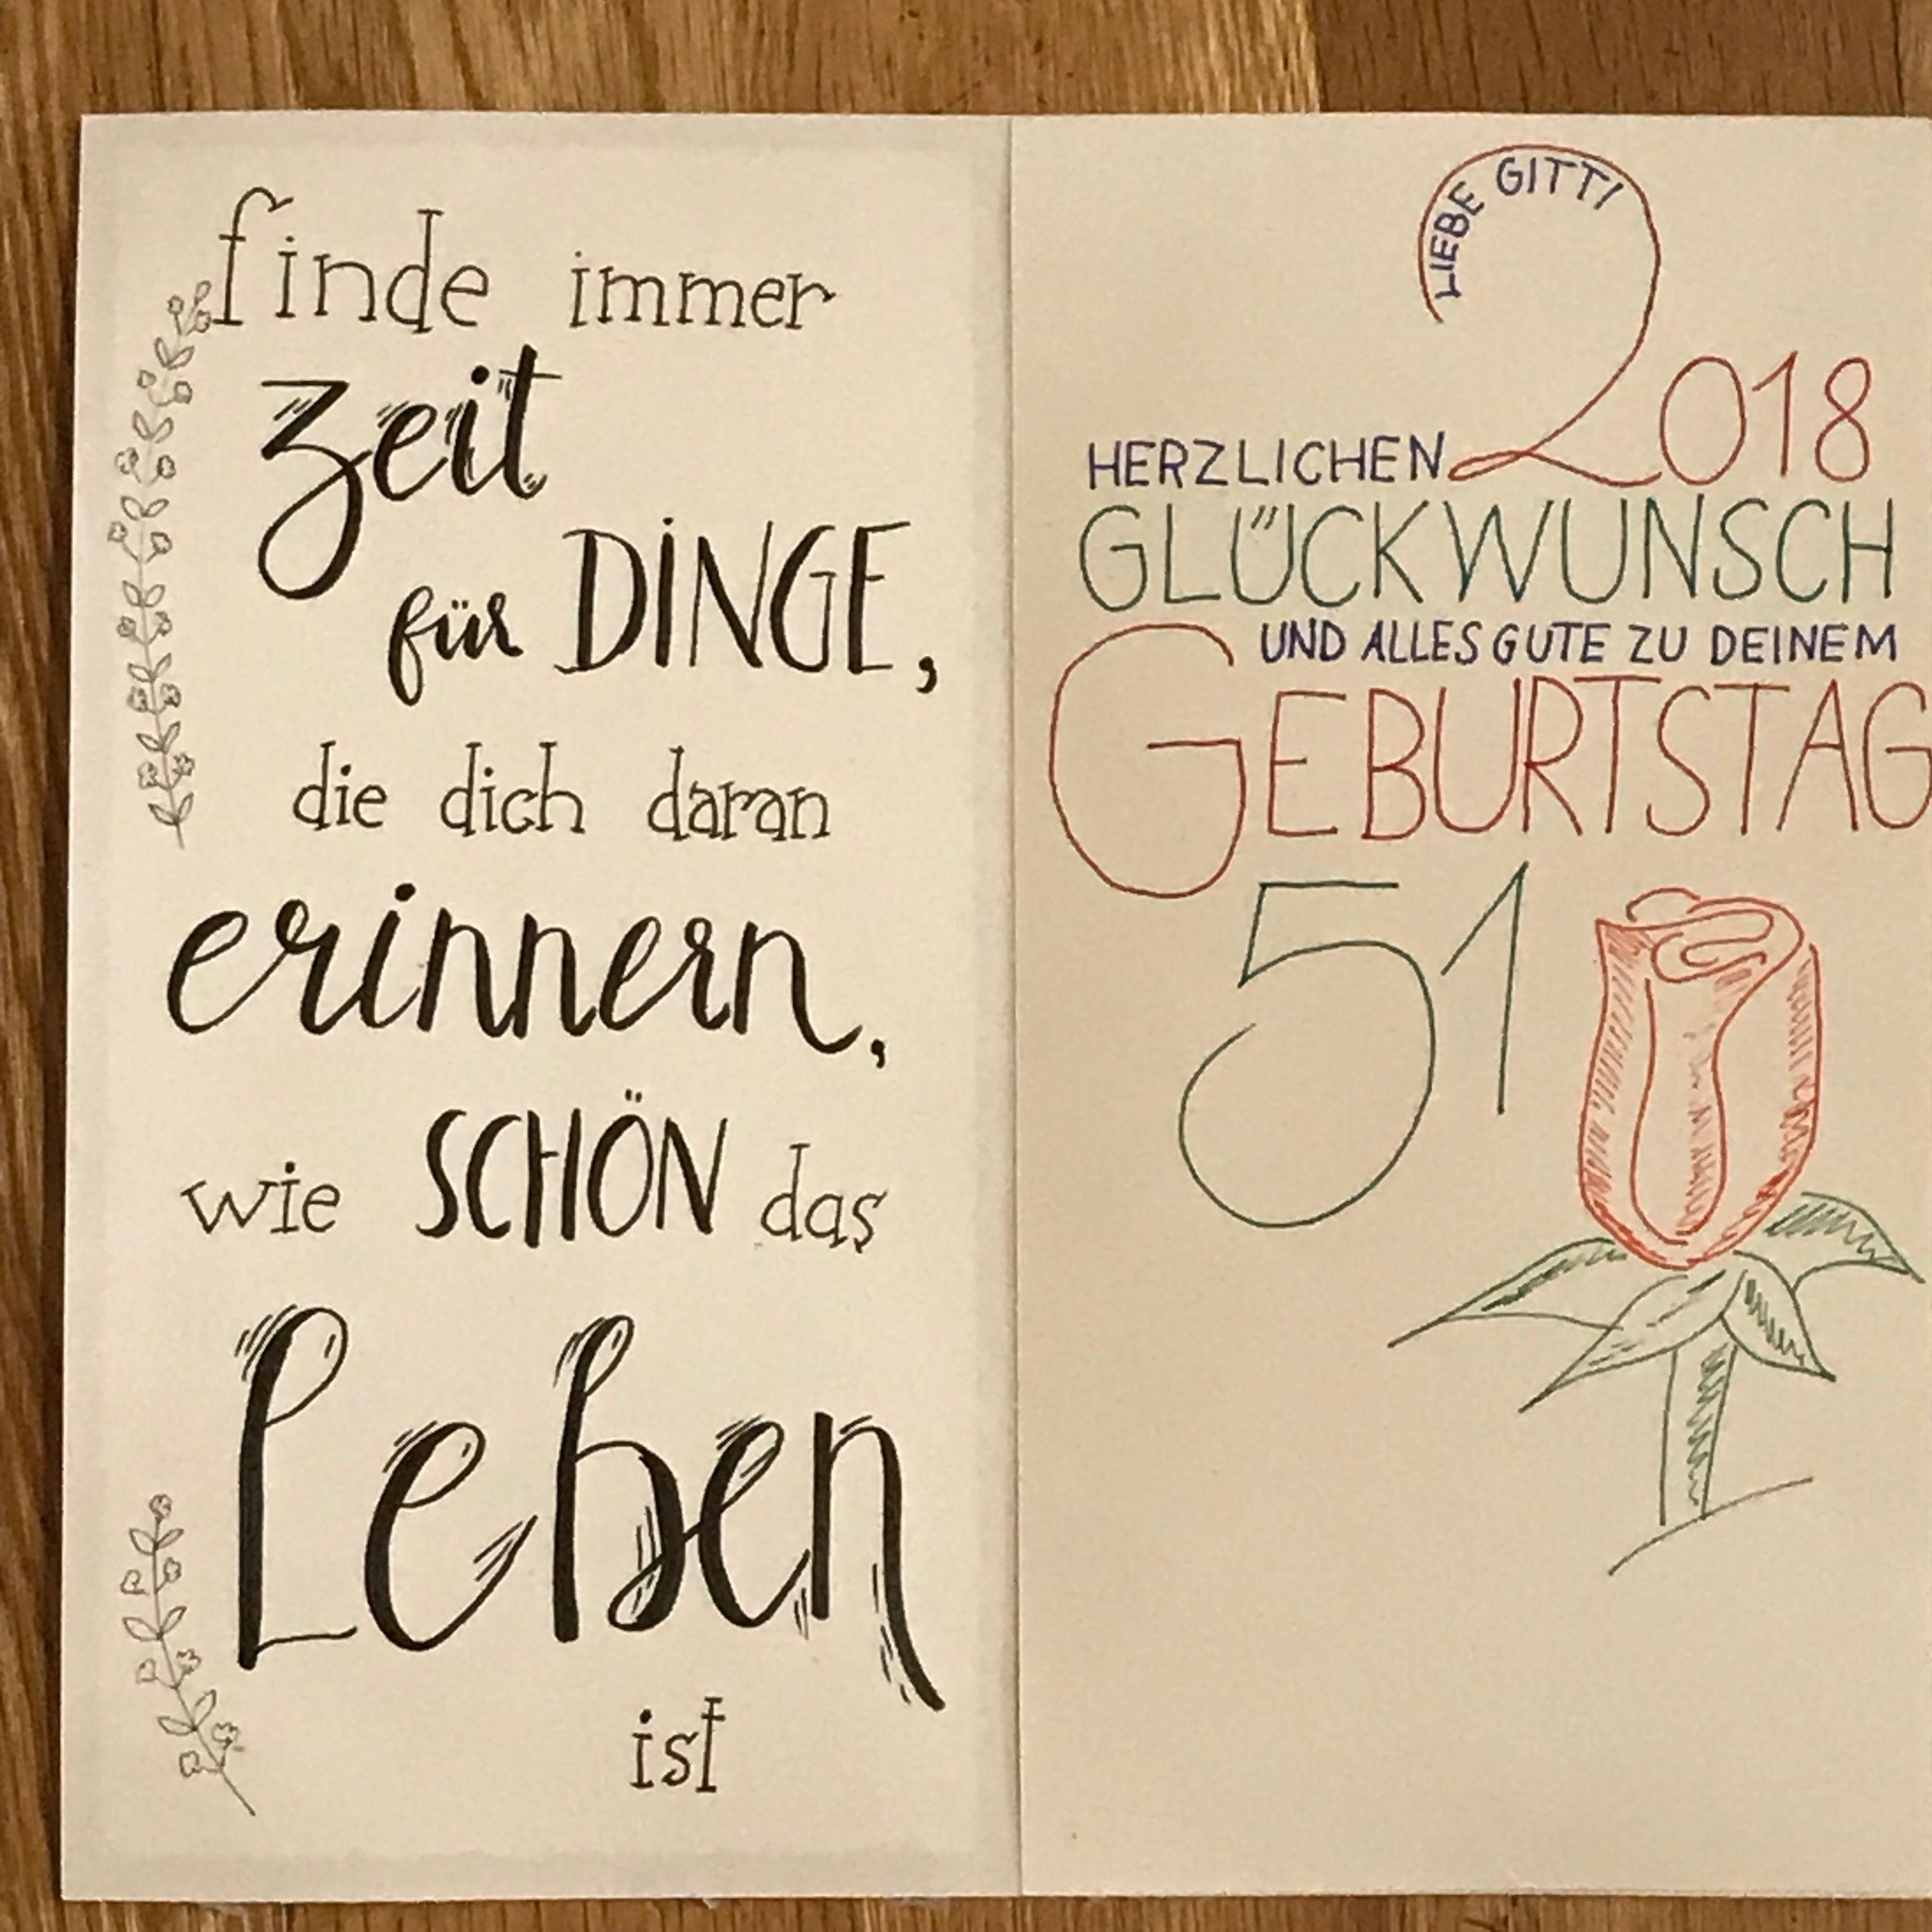 Geburtstag Geburtstag Zitate Gluckwunschkarte Geburtstag